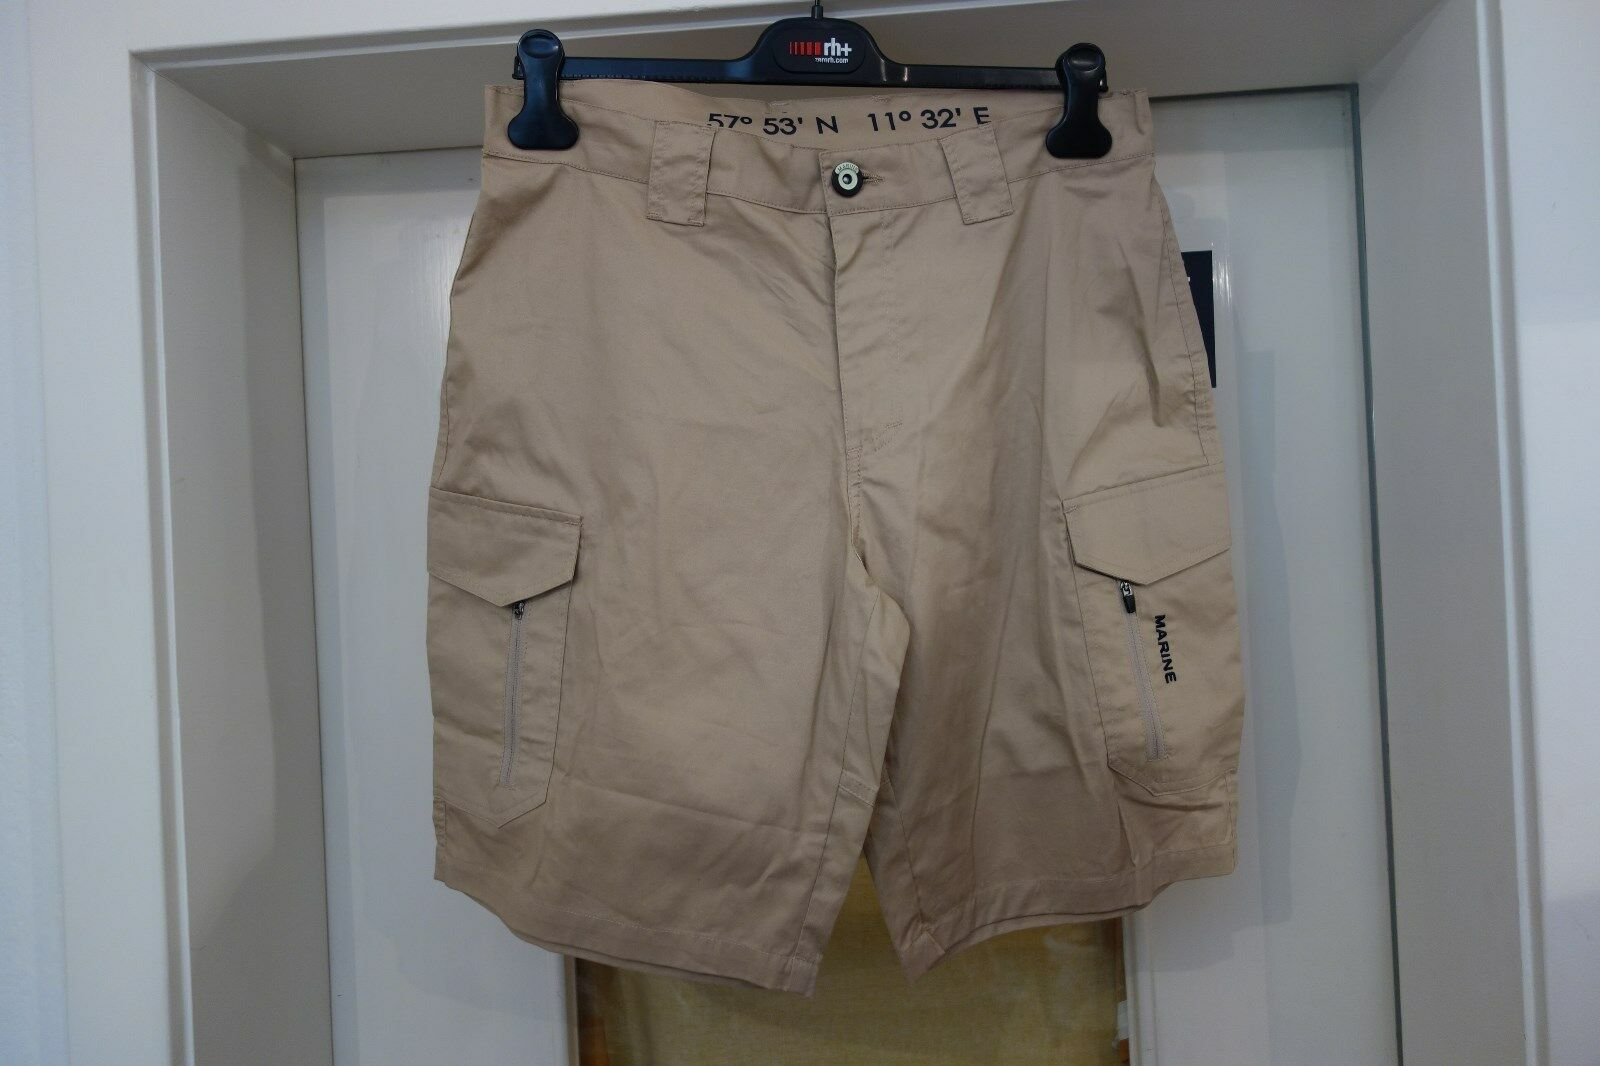 Marineshort Pantaloni da Corsa Pantaloni per Tempo Libero Ciclismo Nuovo, TGL M